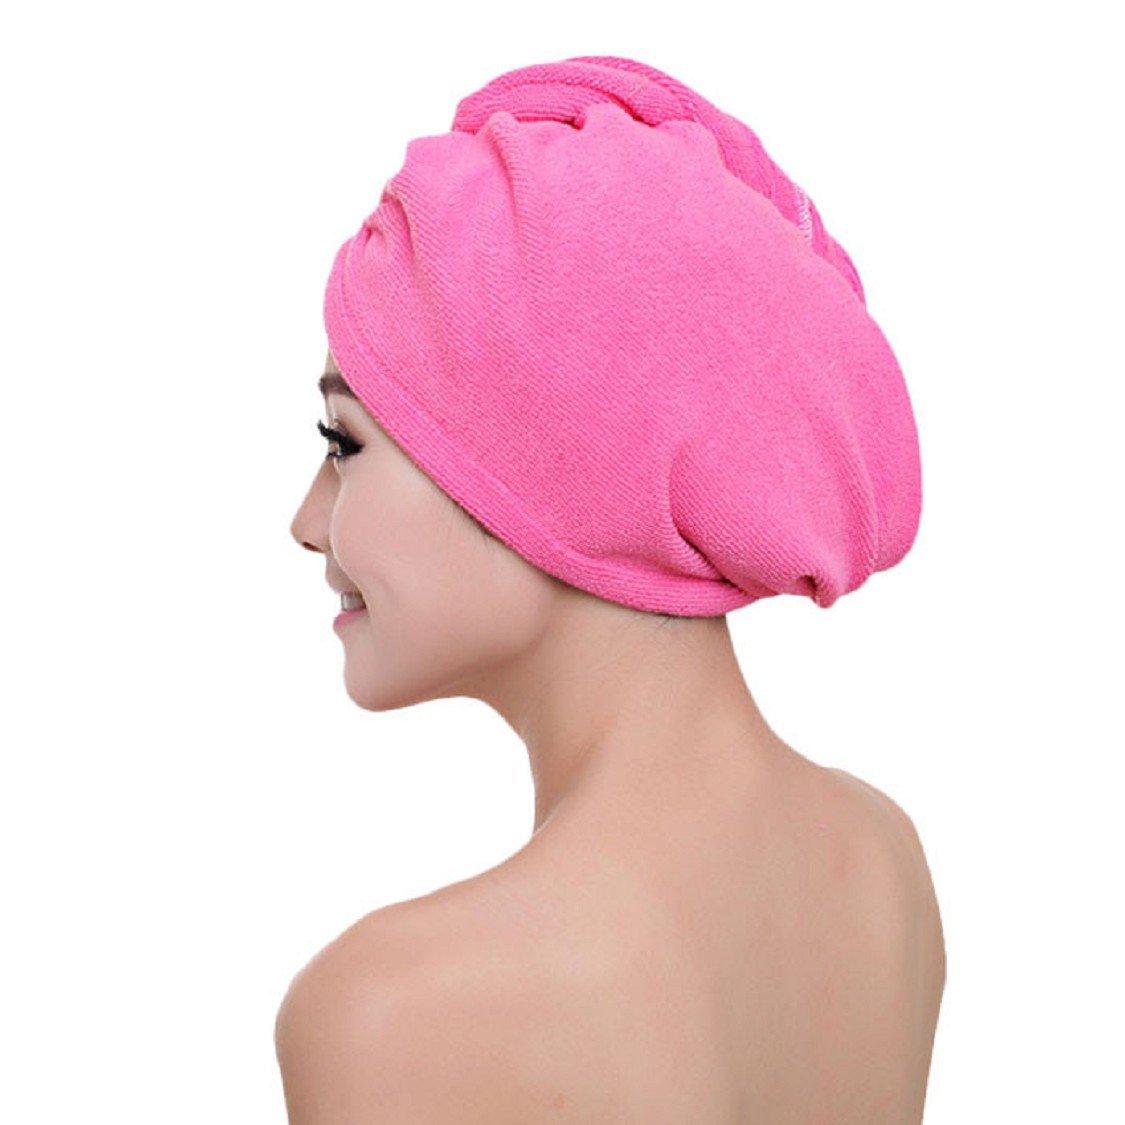 Ikevan Fashion Women Absorbent Microfiber Towel Turban Hair-Drying Cap Bathrobe Hat (08)